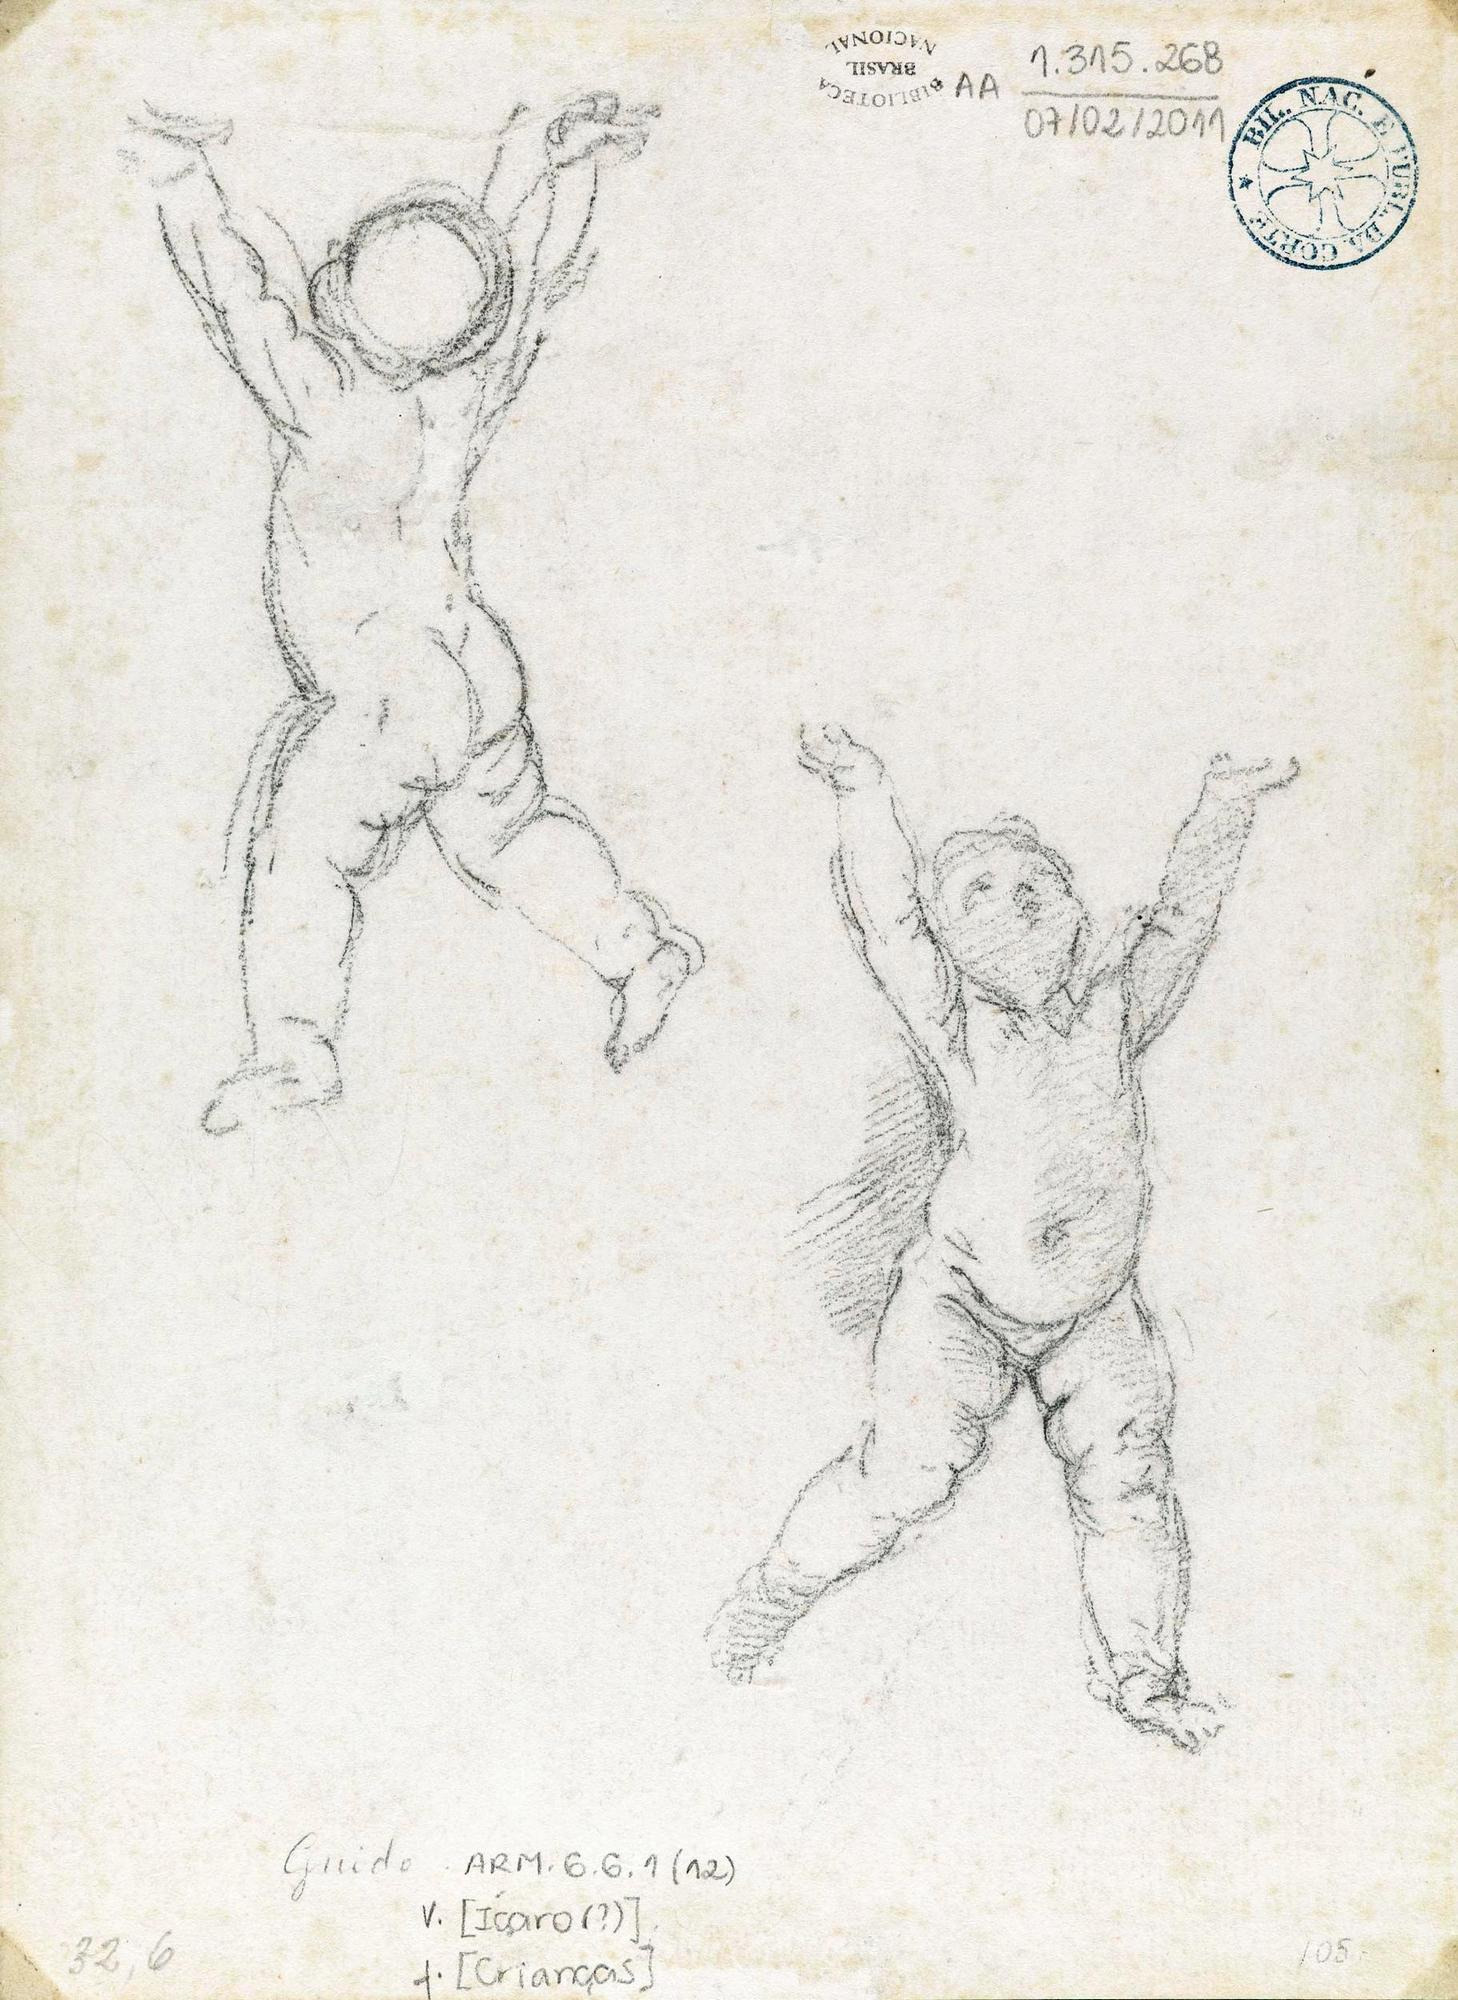 Guido Reni, Studio per due putti, XVI-XVII sec. Rio de Janeiro.